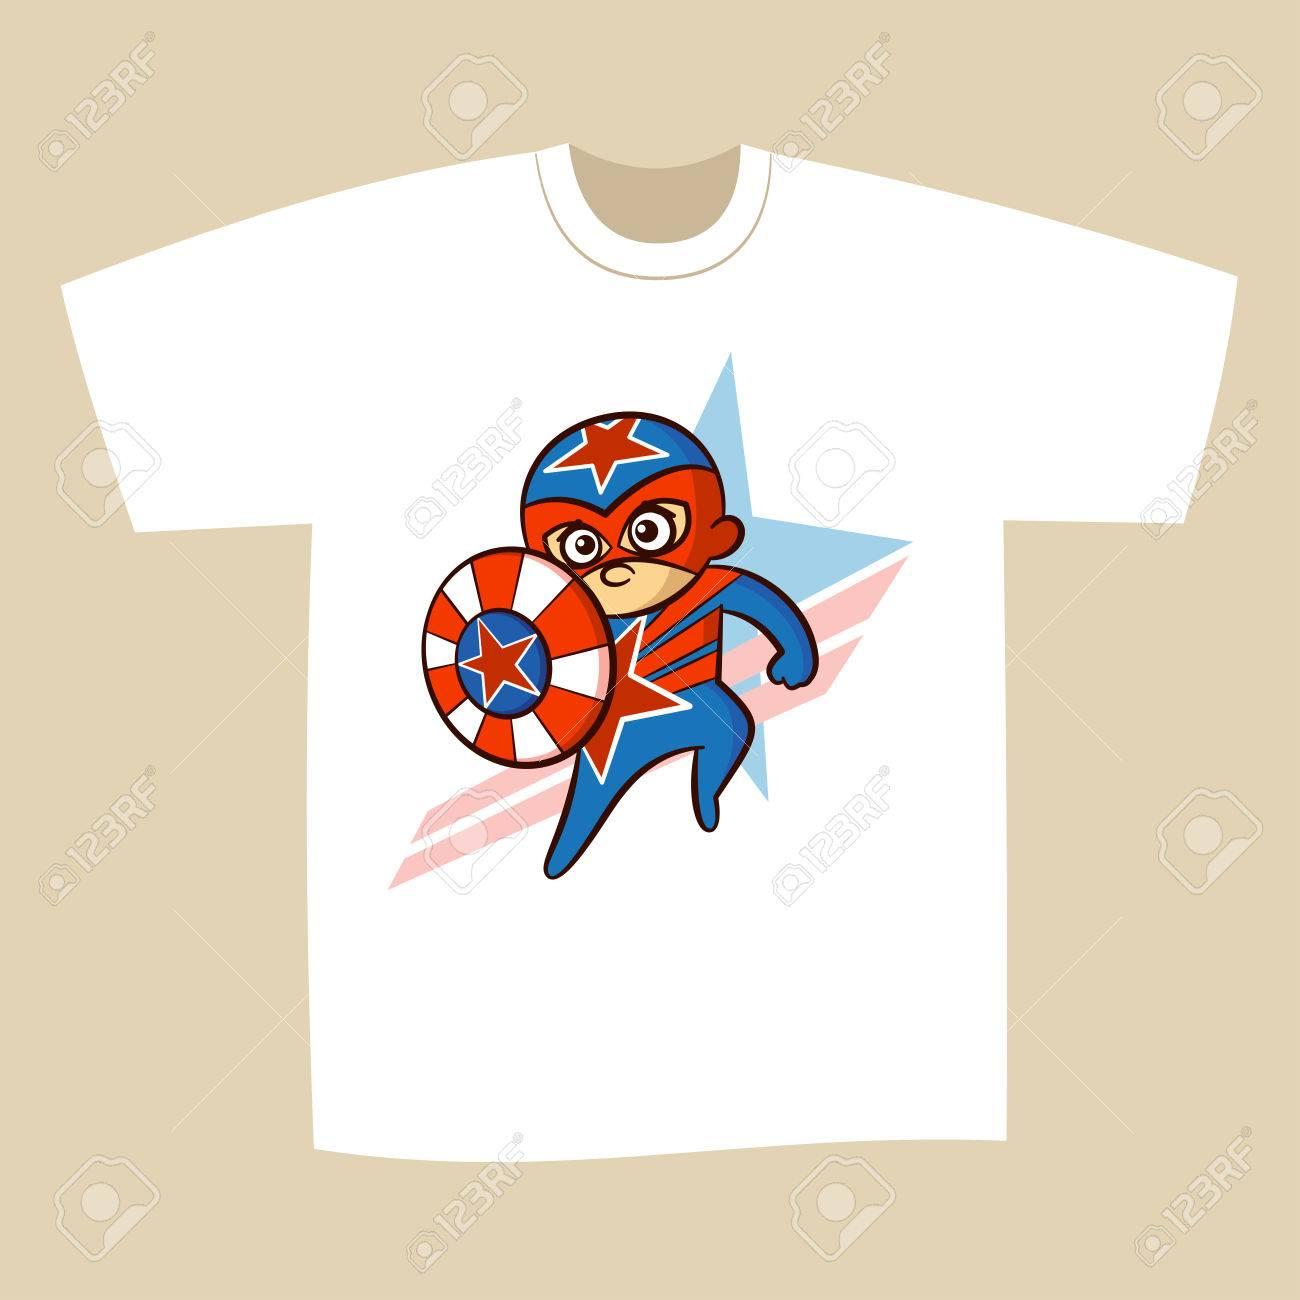 75c476fe T-shirt Print Design Cartoon Superhero Vector Illustration Stock Vector -  78678032